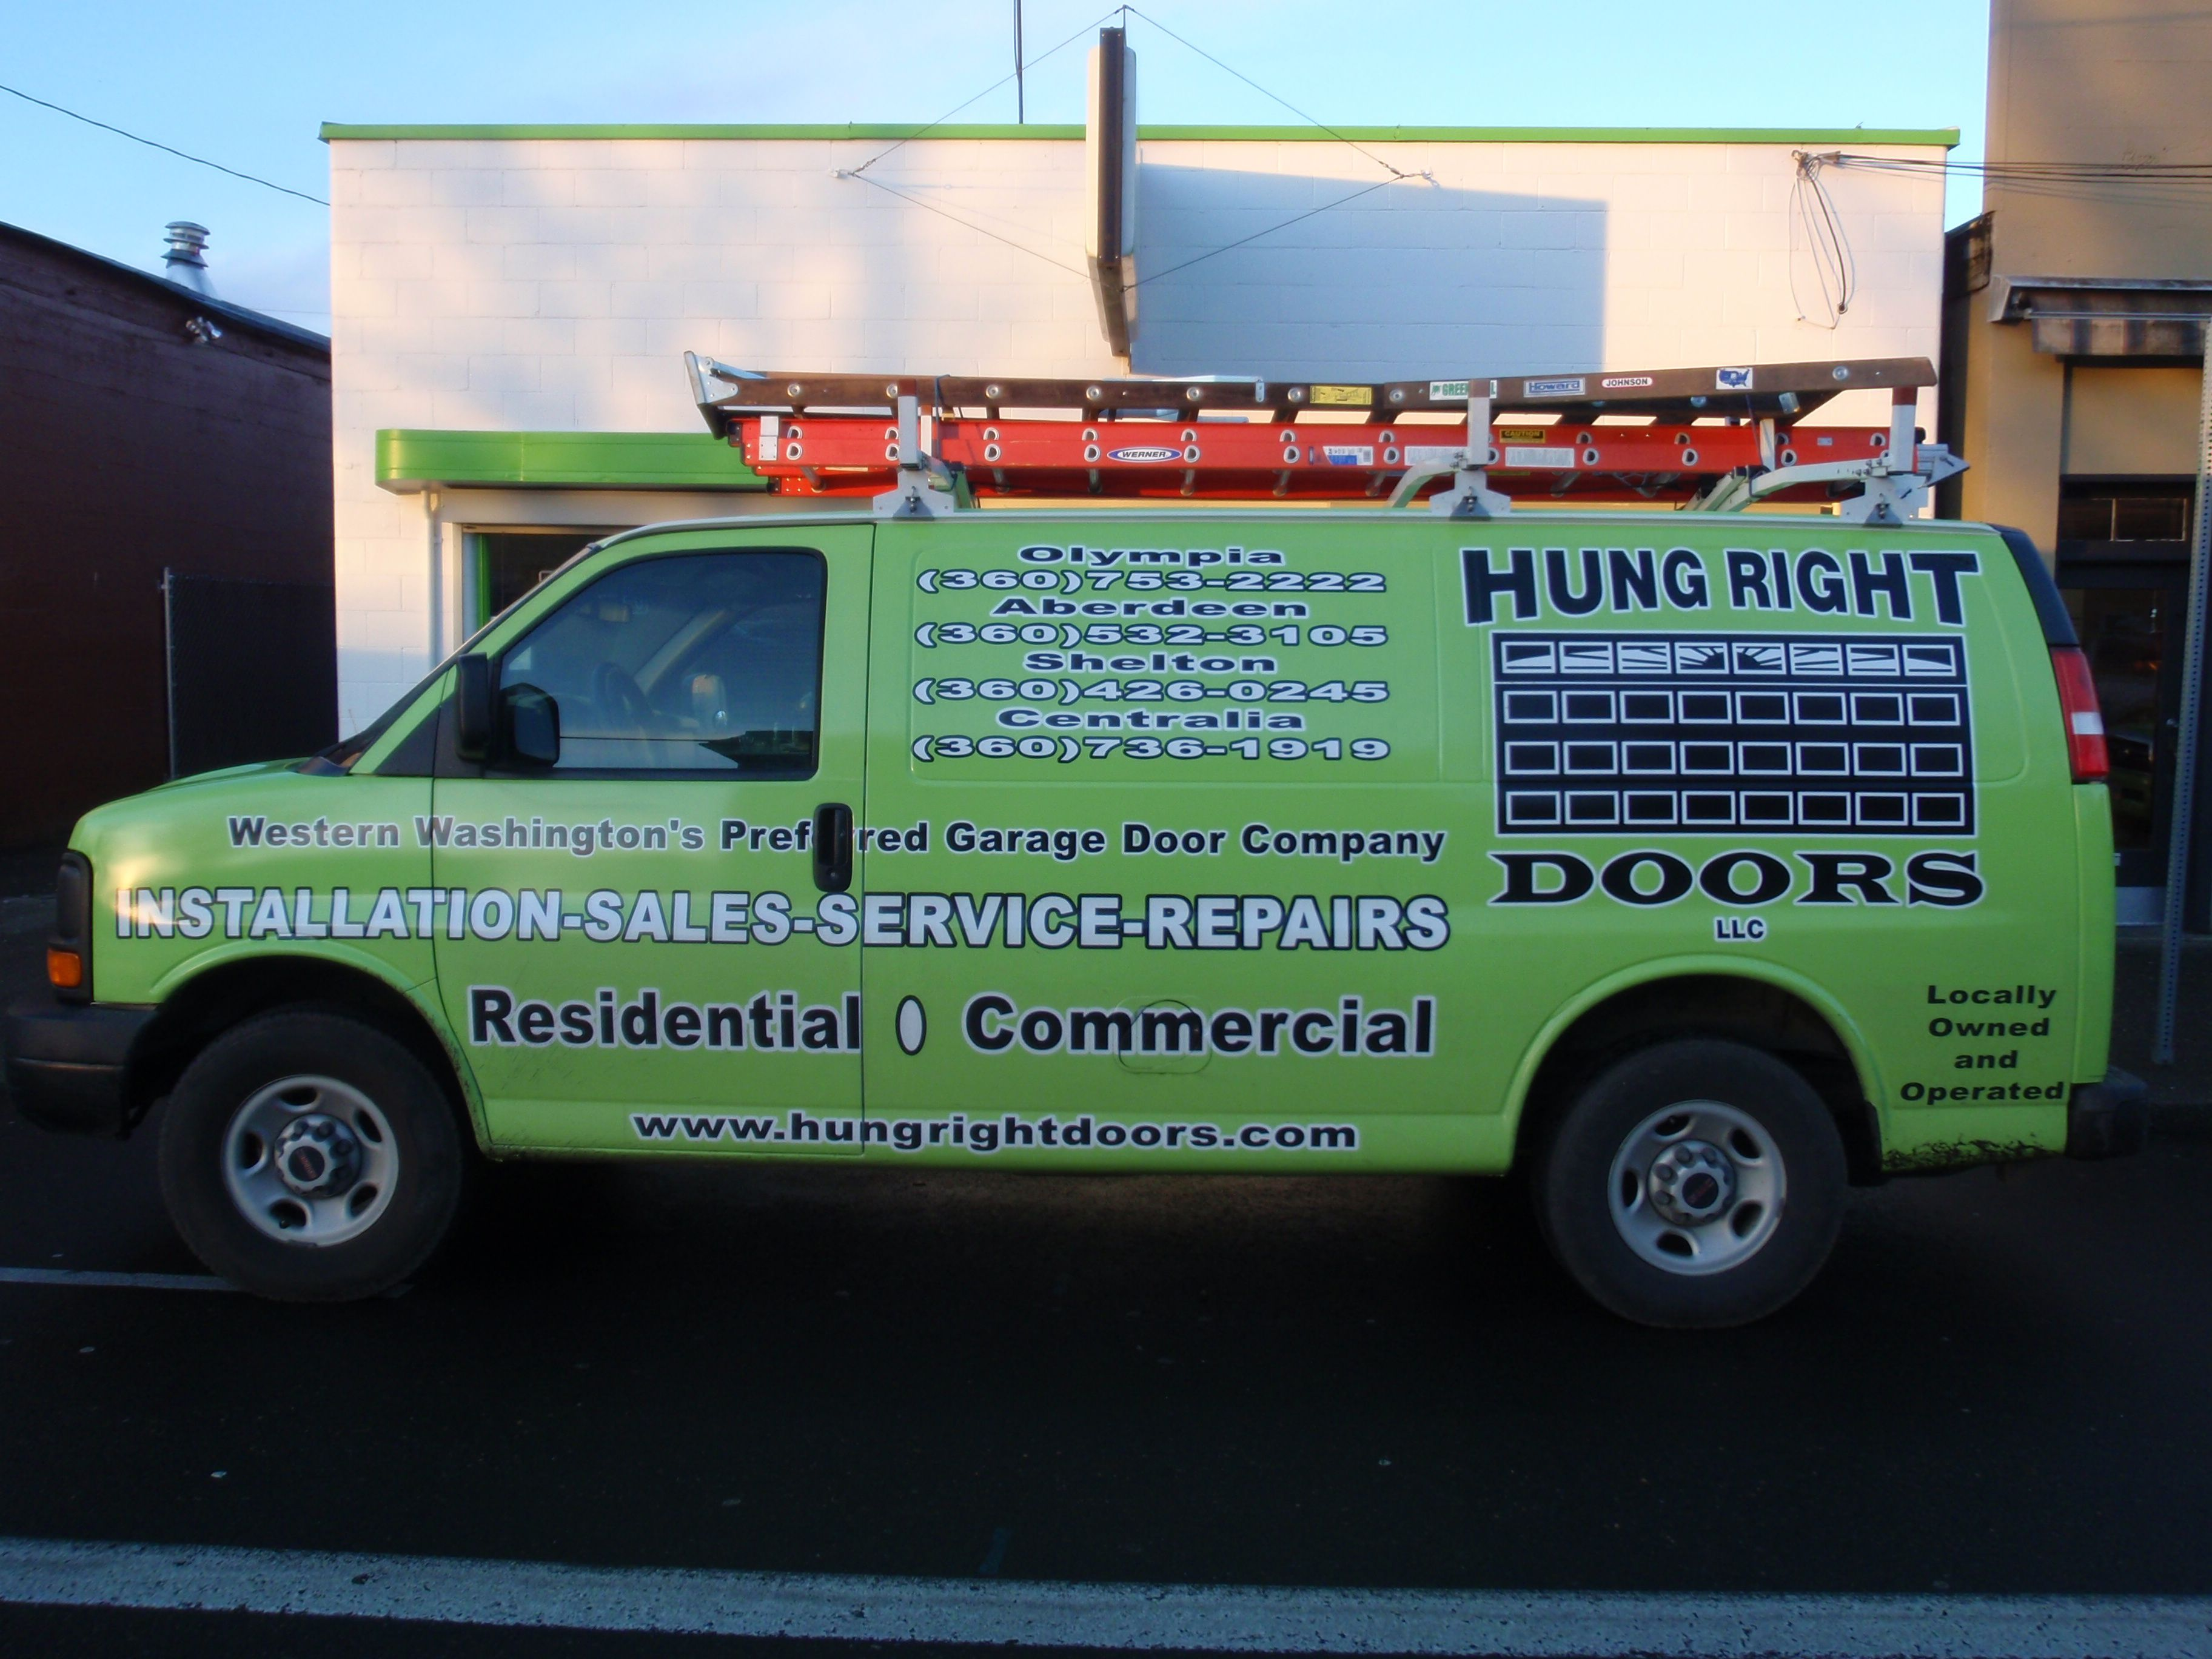 Hung Right Doors Service Van